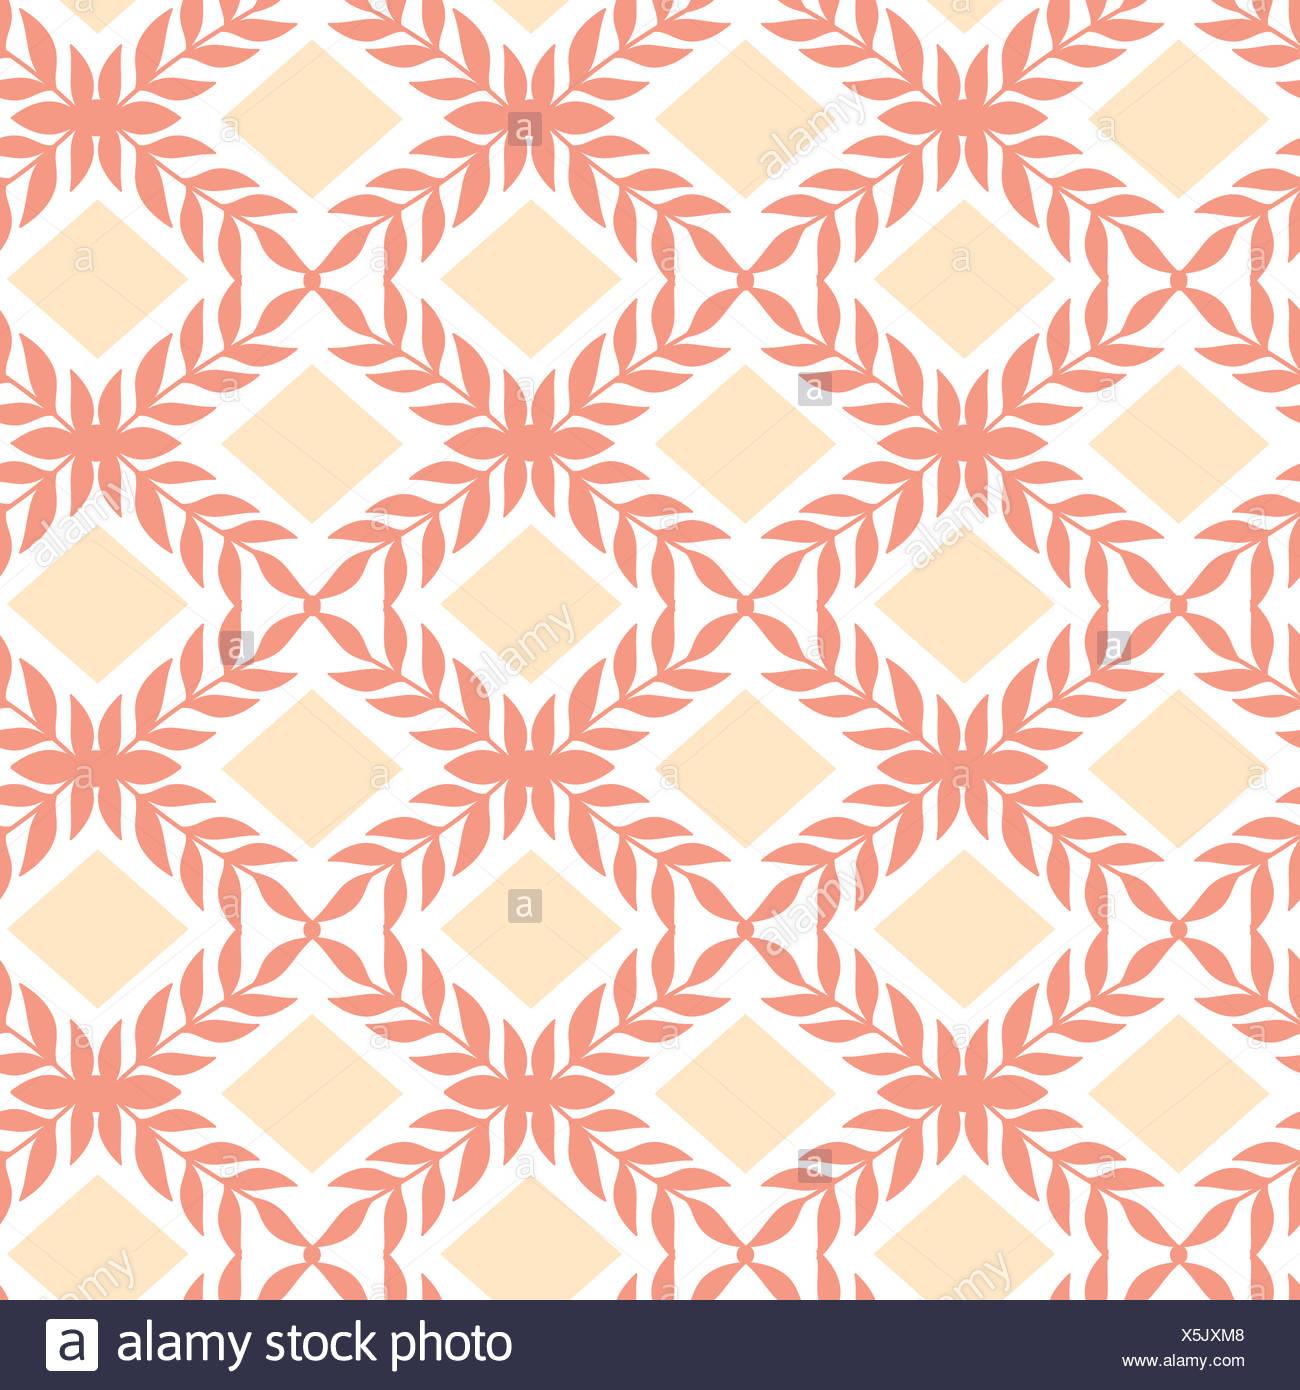 ... Holiday Sayings Peach Orange Argyle Retro Seamless Pattern Background  X5JXM8 Wedding Letter Template Etamemibawacohtml Reading Coach Cover Letter